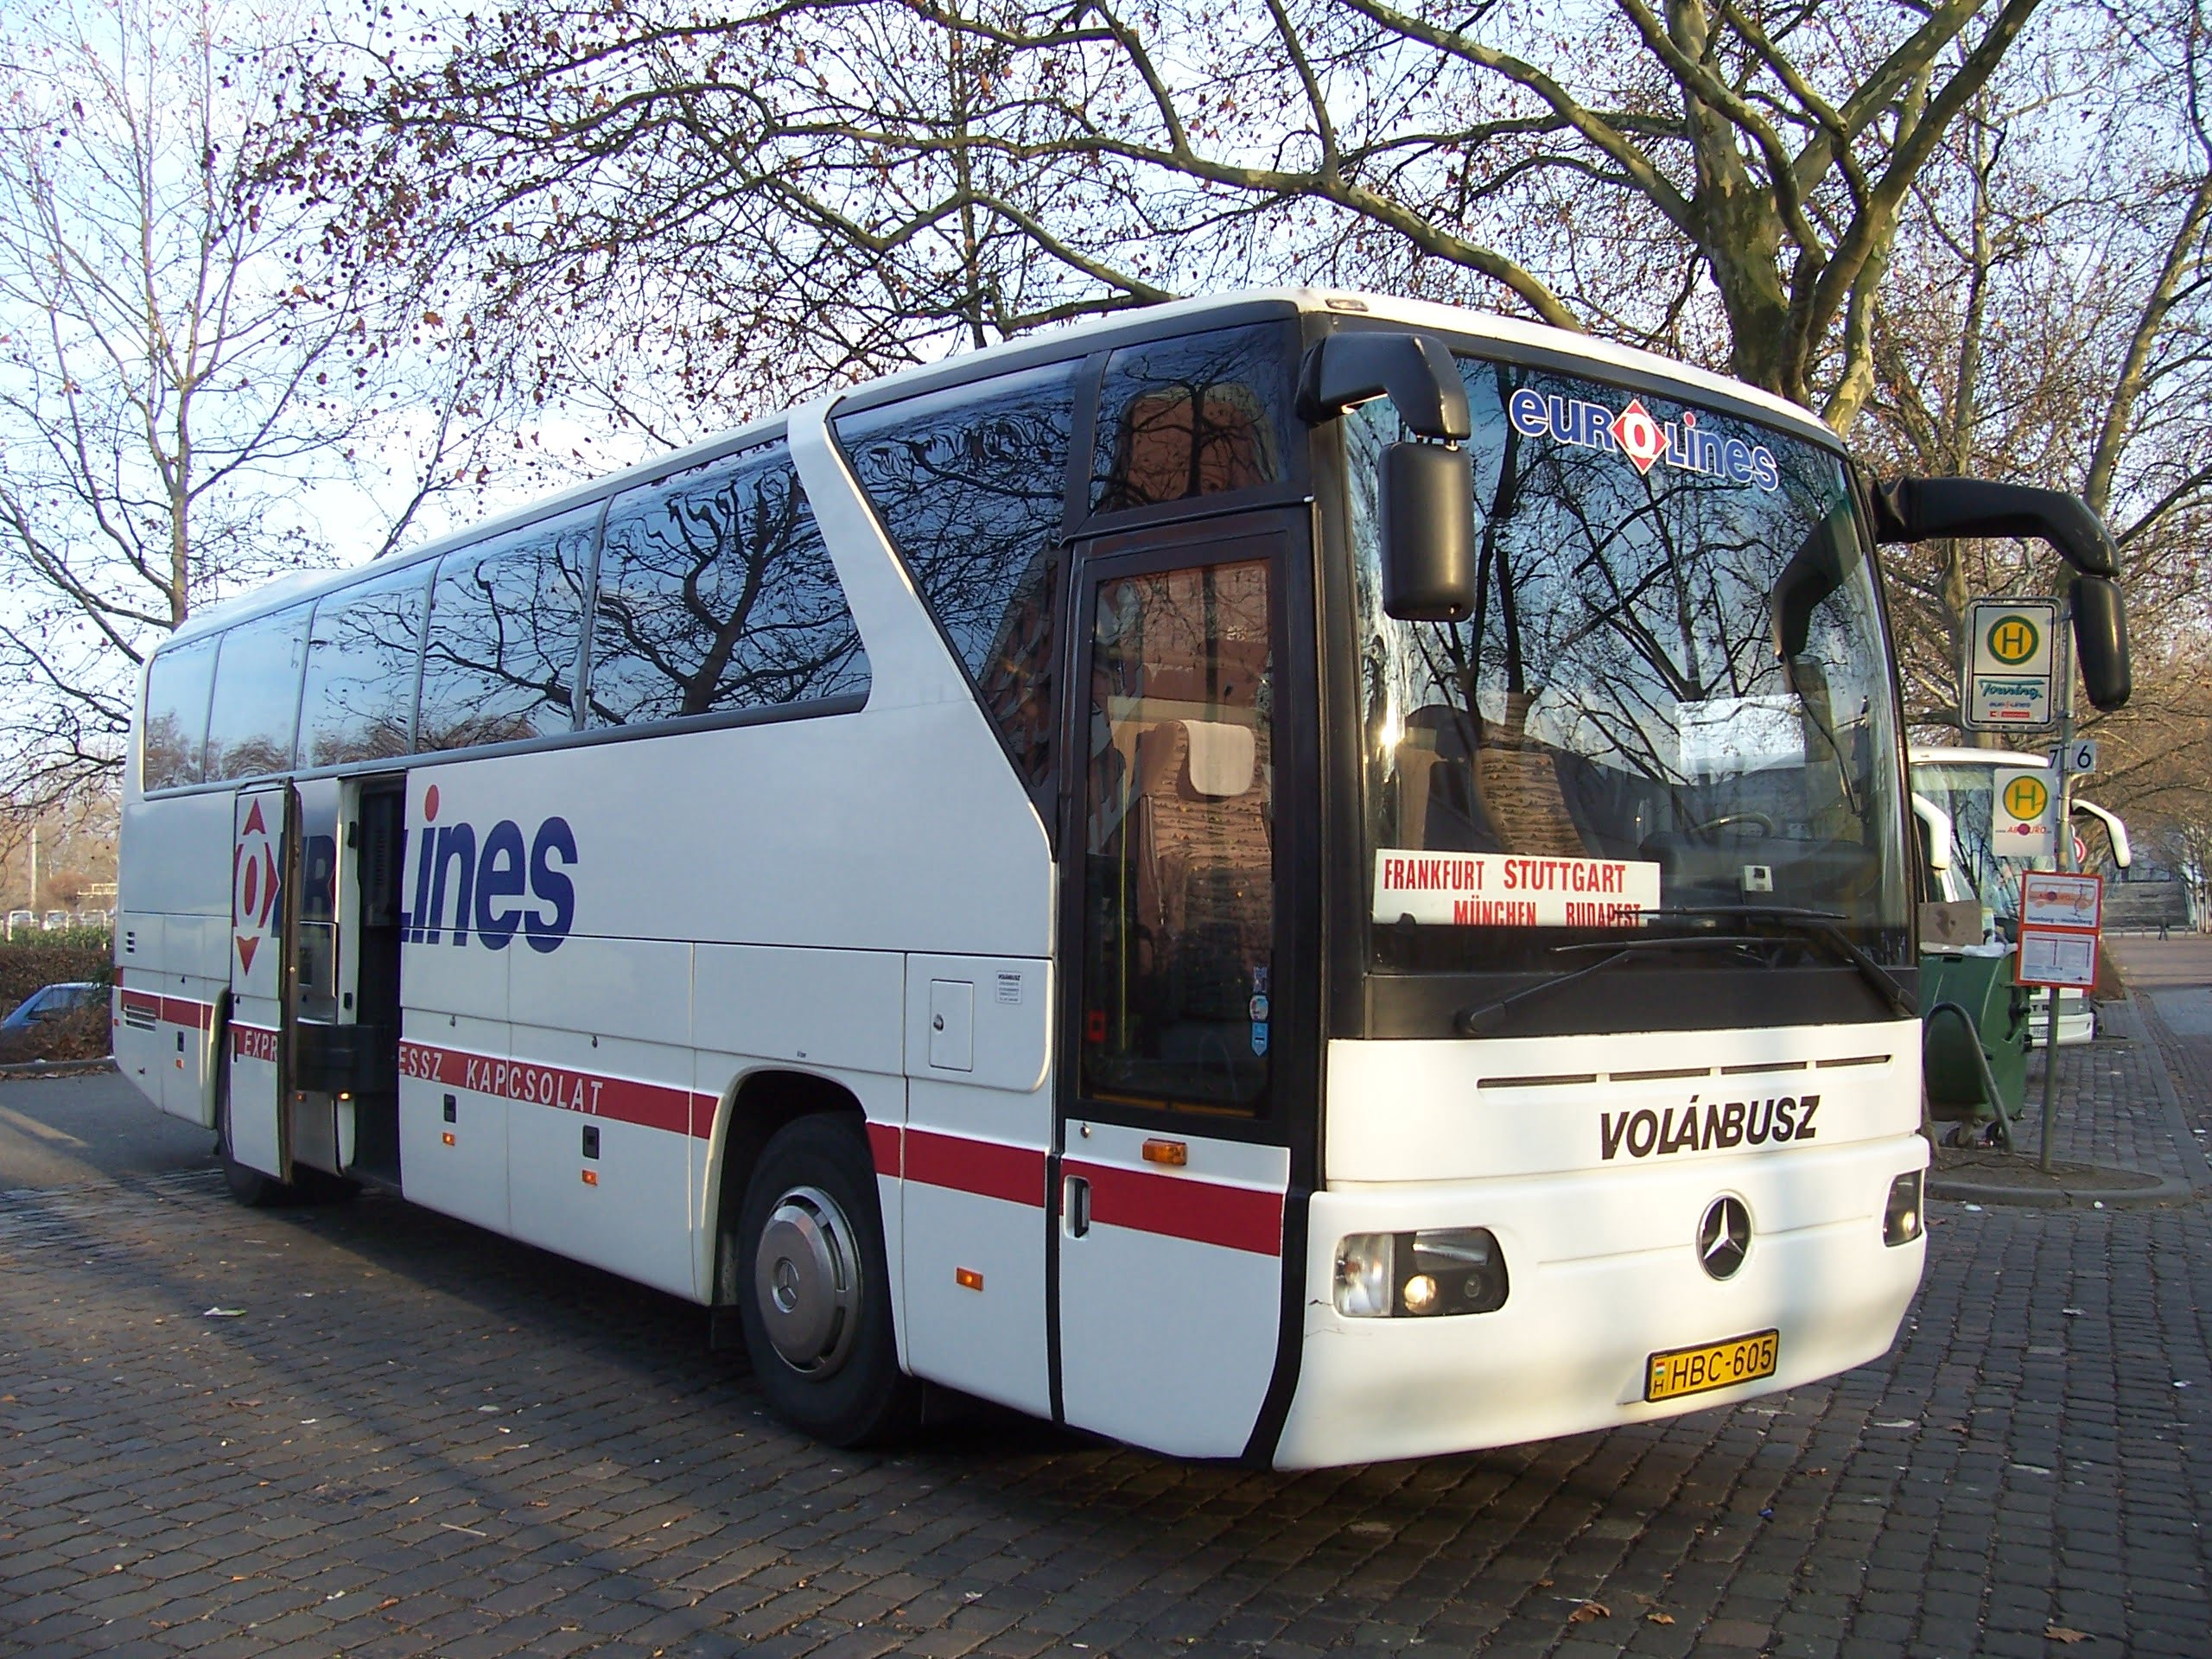 viajes en autobus europa: